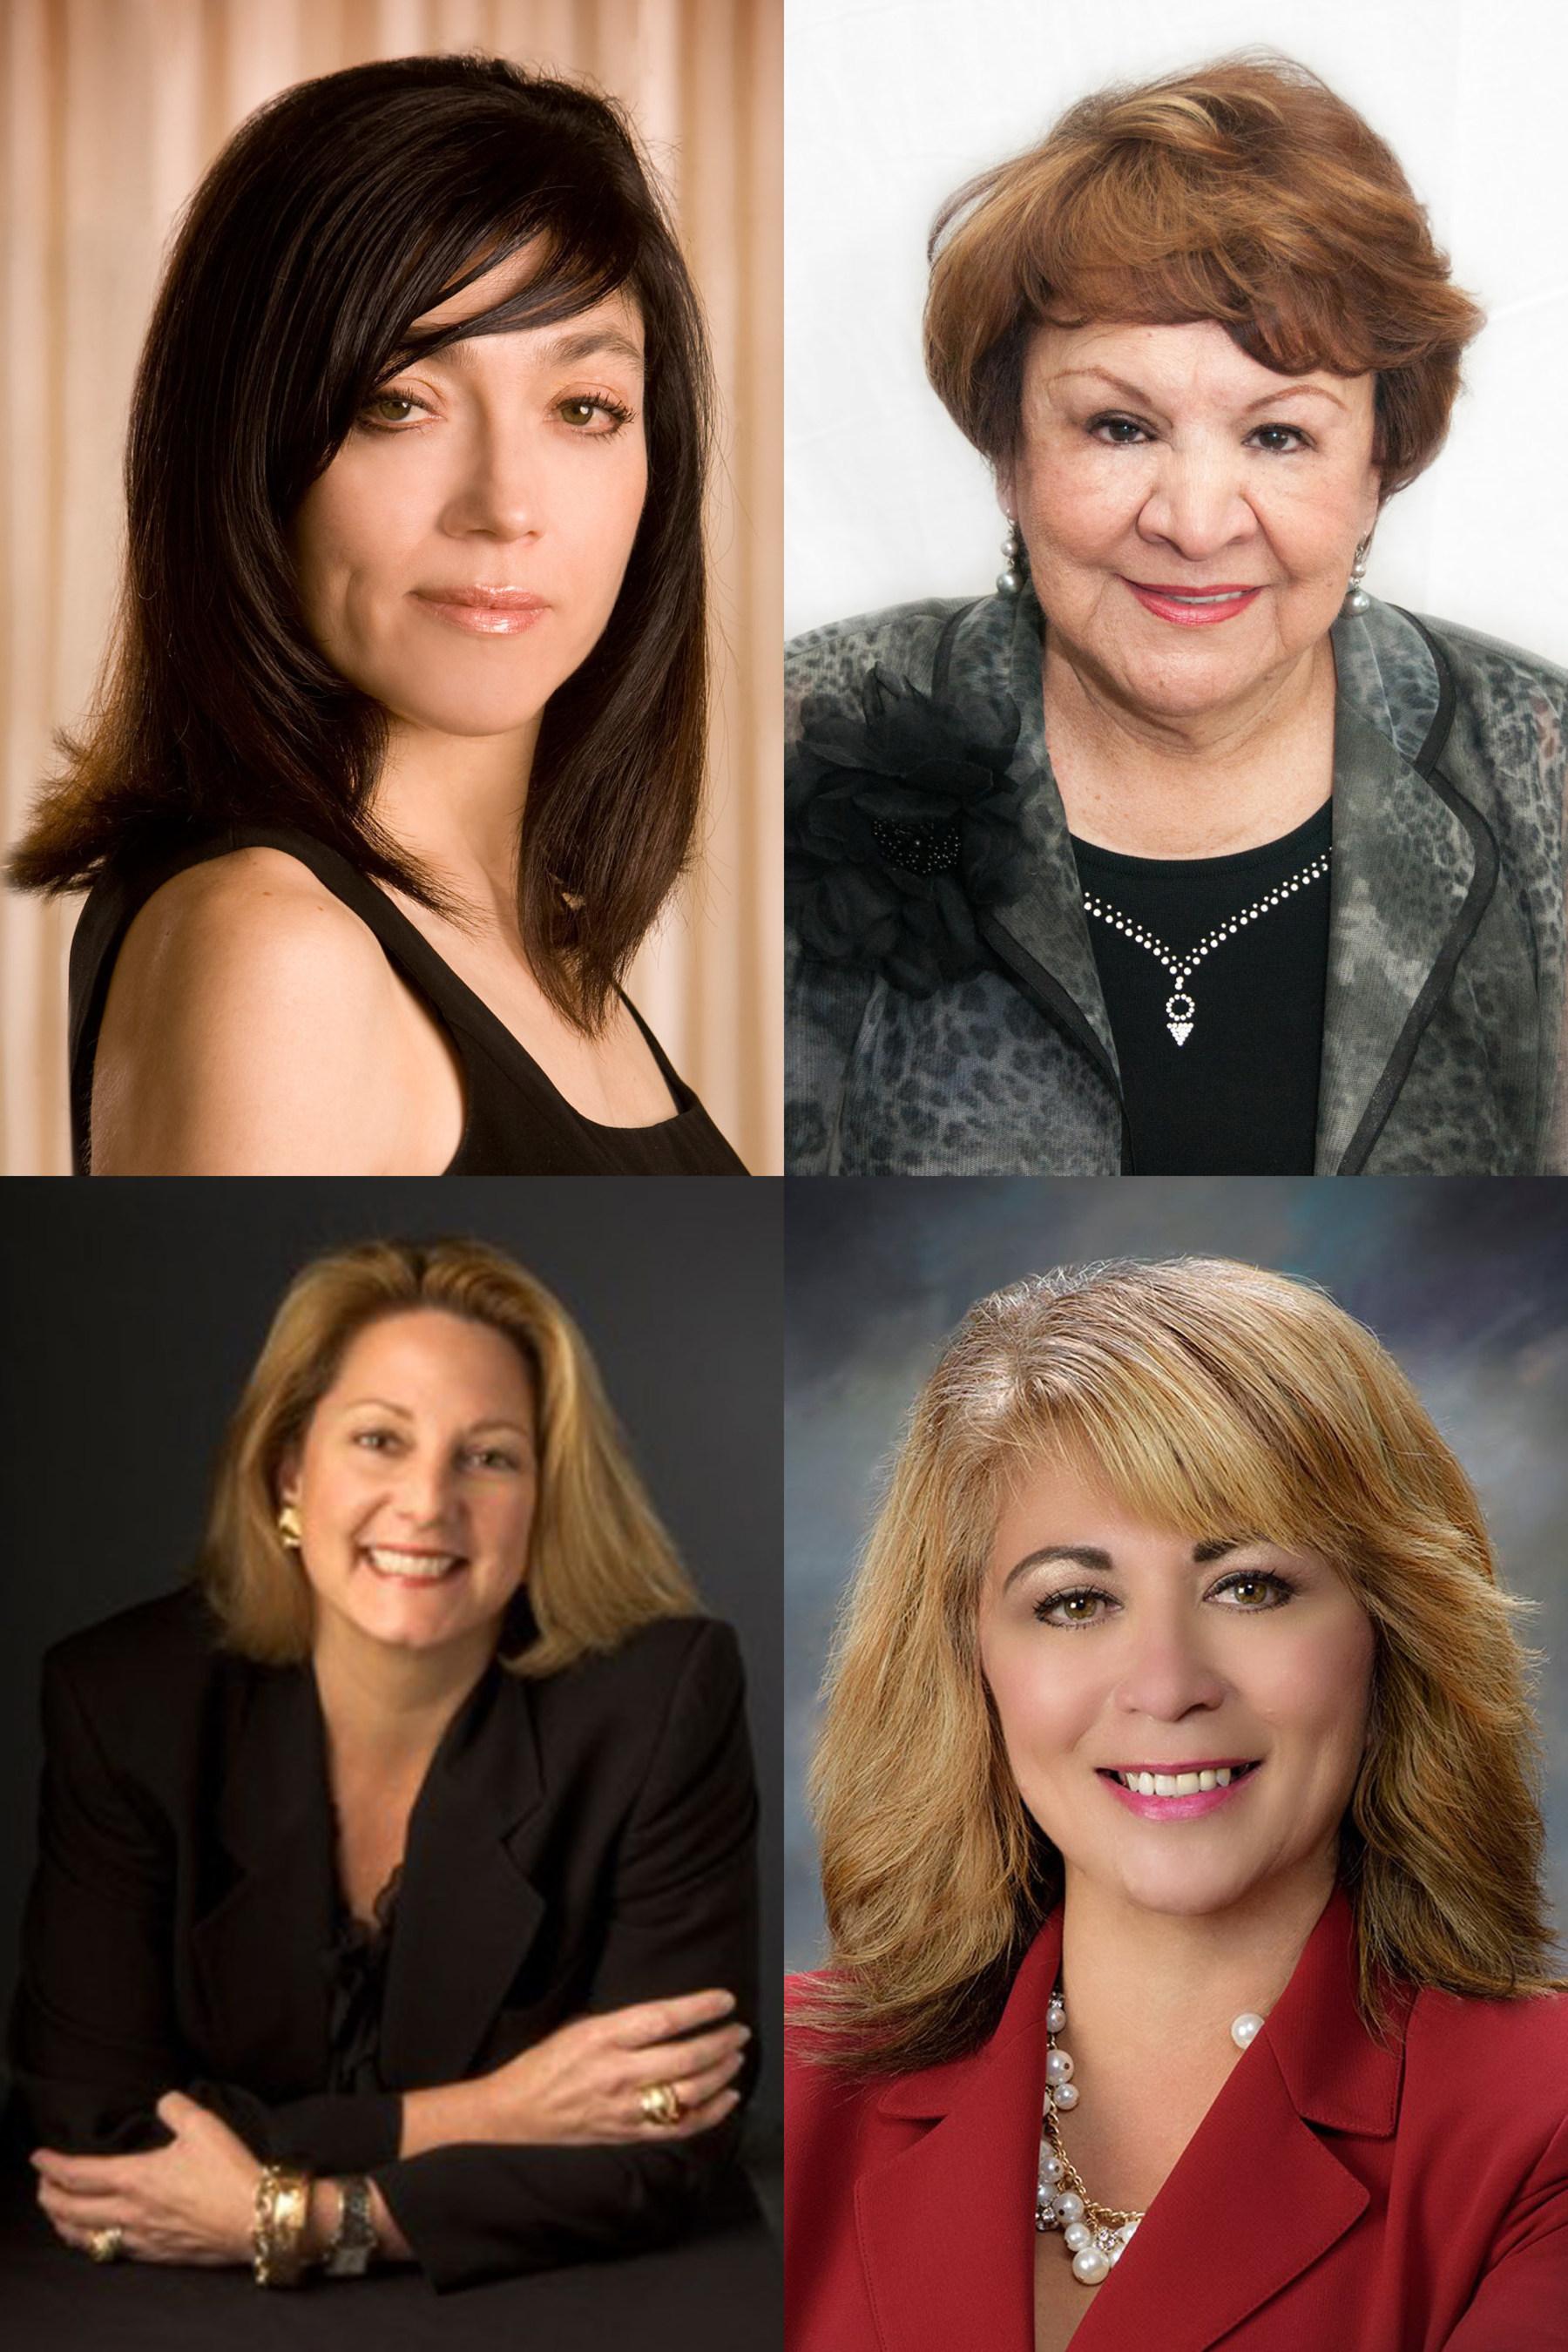 Top row, from left to right: Suzana Kubota, Pauline Martinez; Bottom row, from left to right, Anne Hensen, Hilda Ramirez